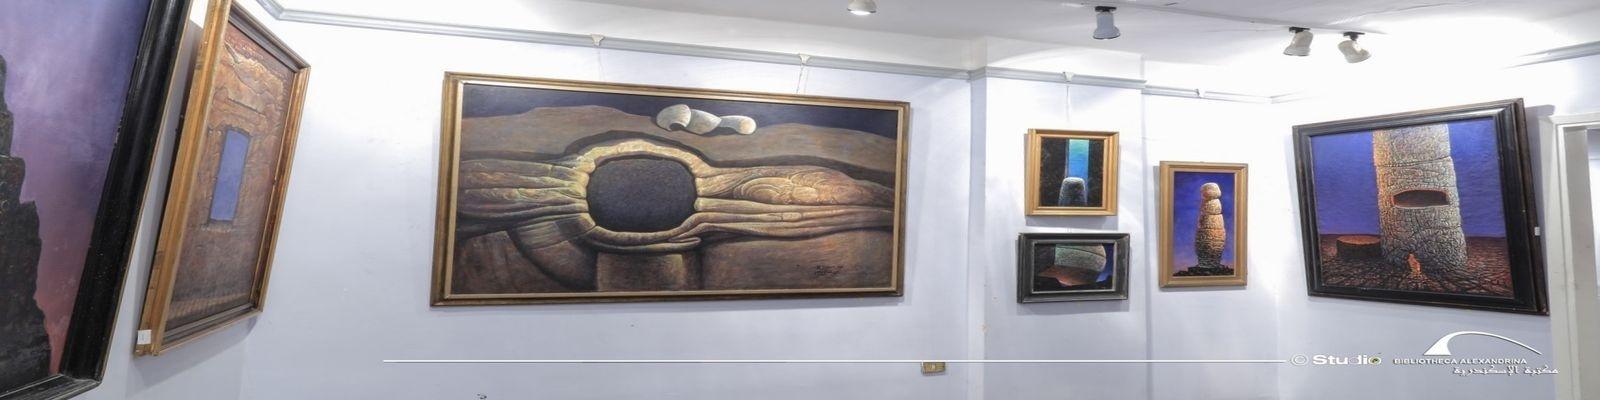 فتح مقر متحف الفنان محمد شاكر